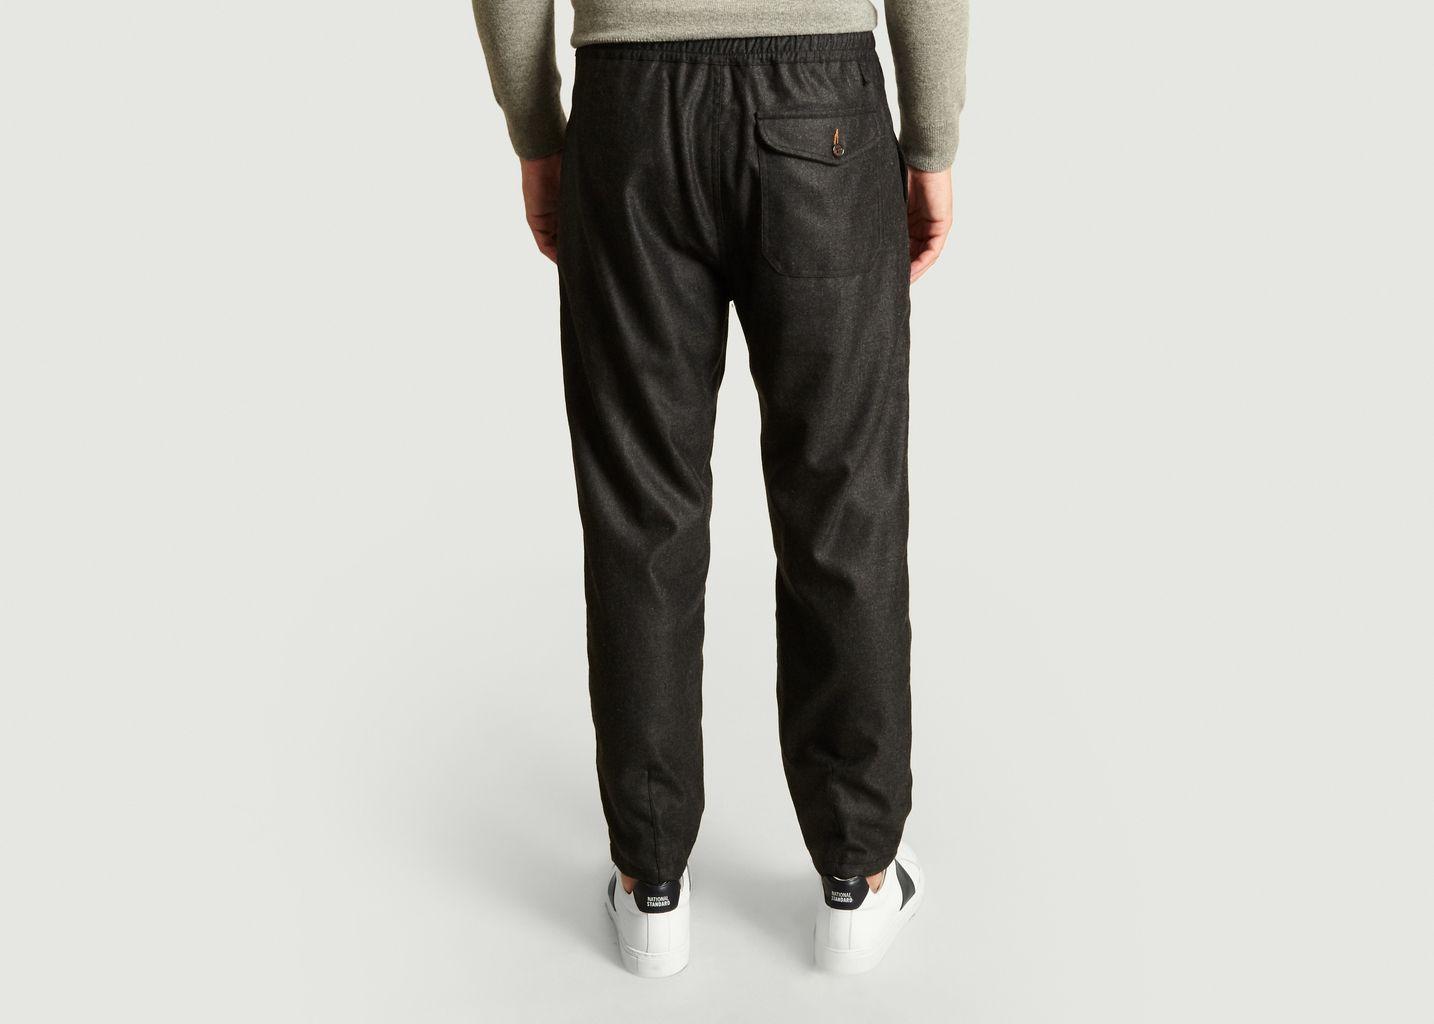 Pantalon Track Flanelle  - Universal Works